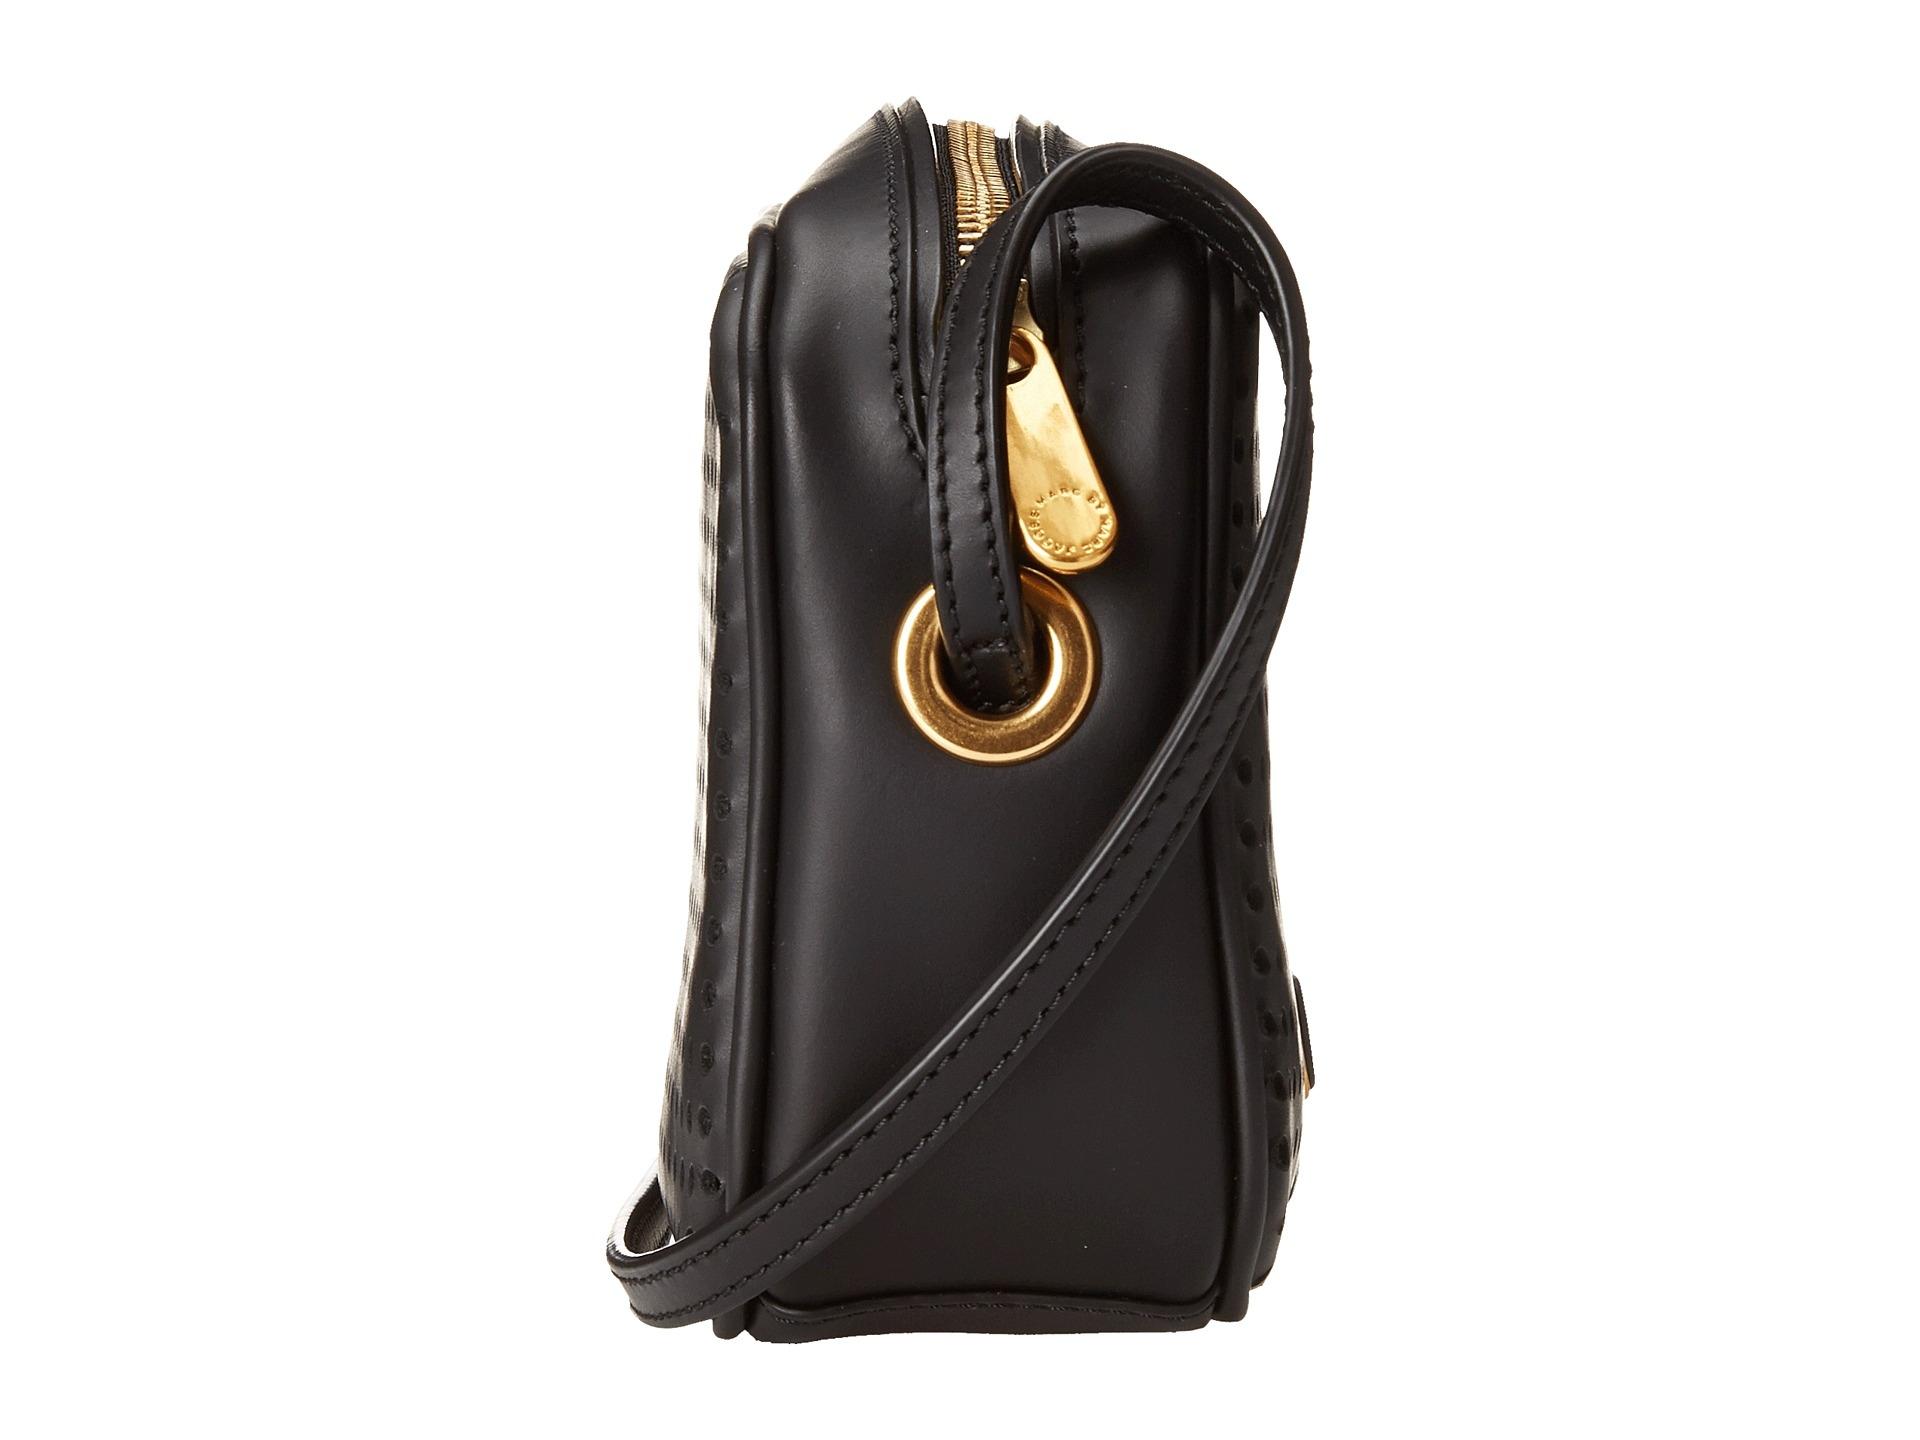 Marc jacobs сумки женские фото - Солокод реплики сумок